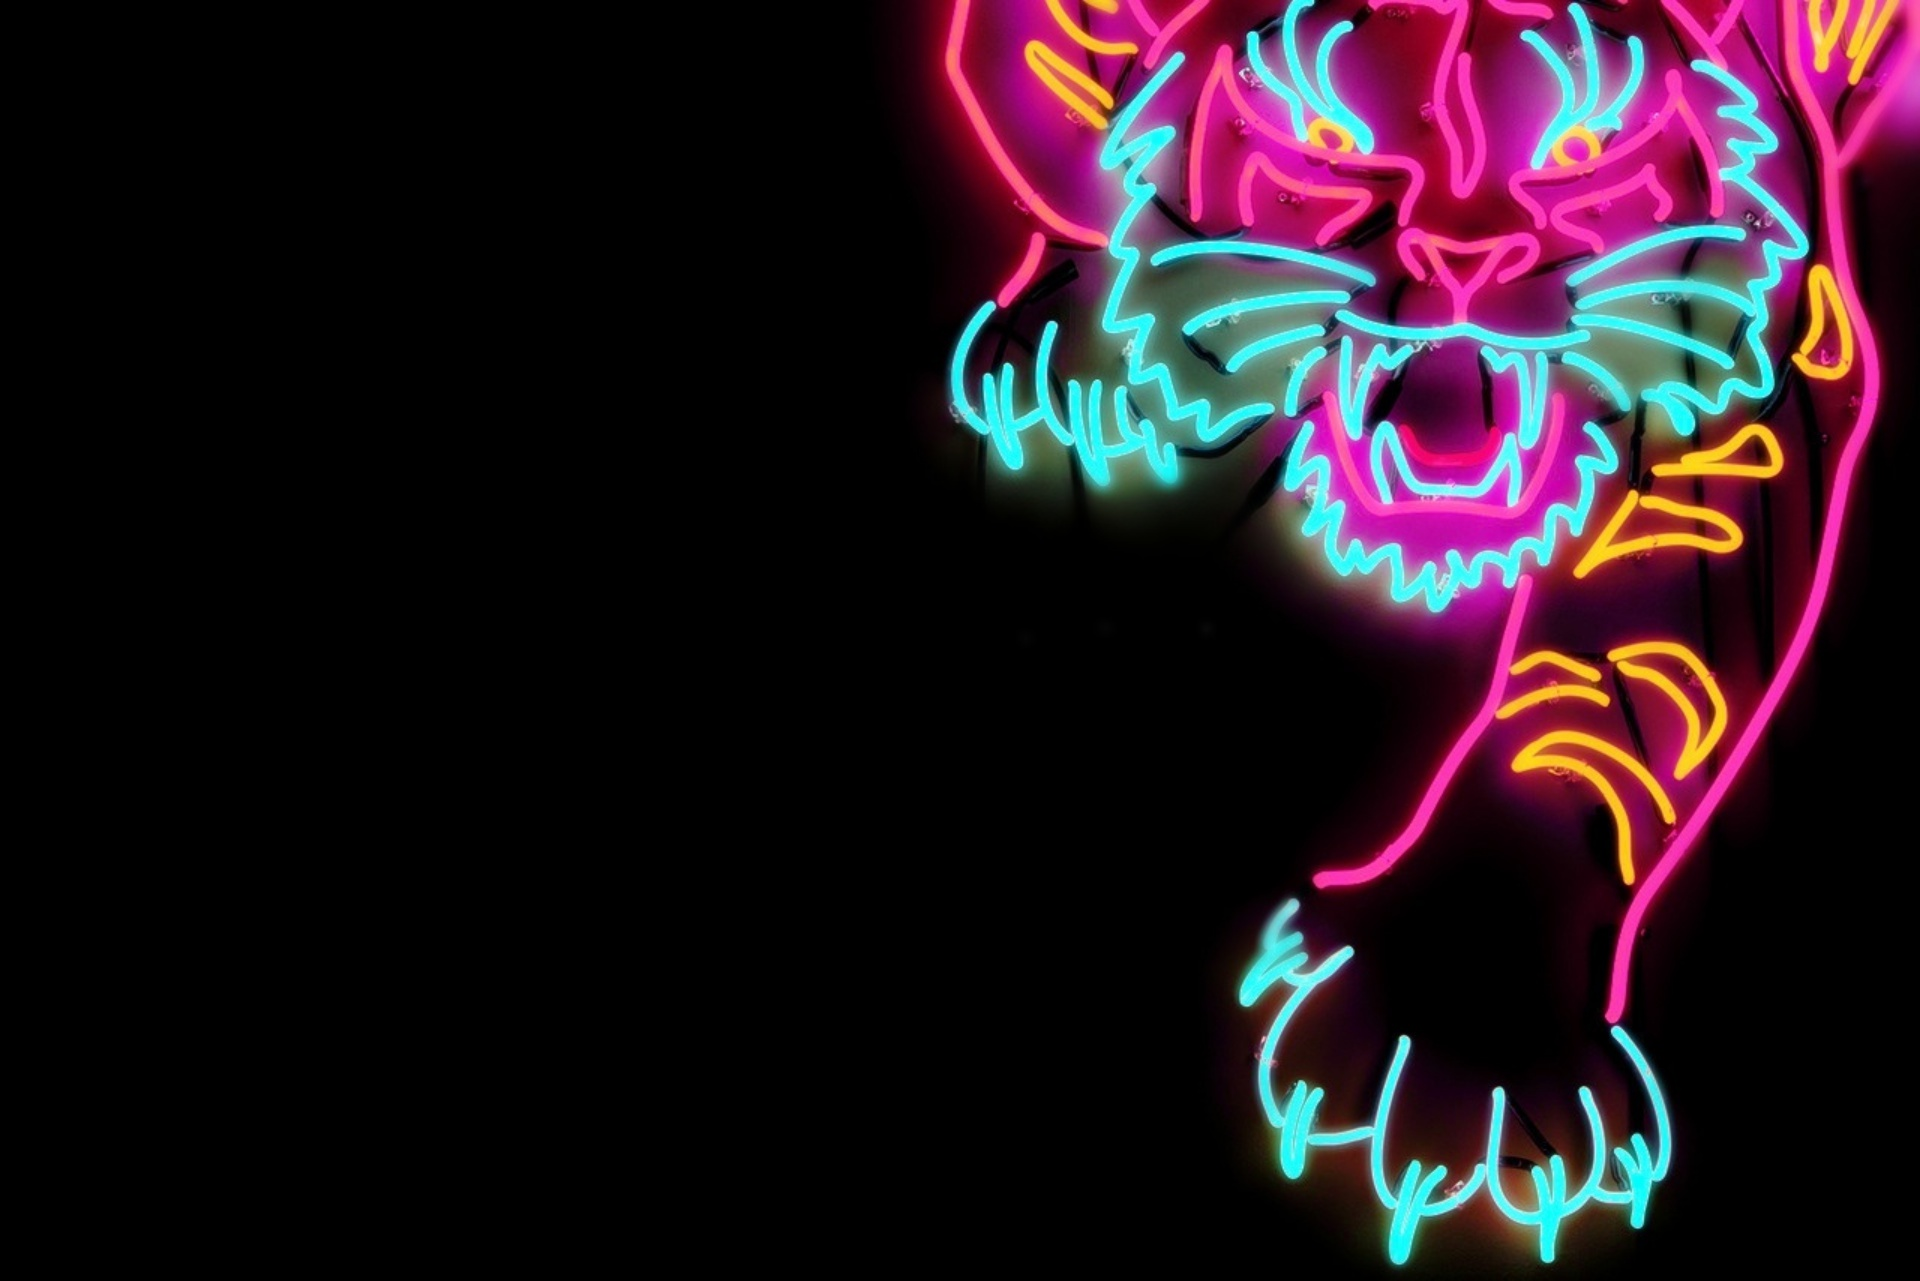 Tiger Neon - HD Wallpaper